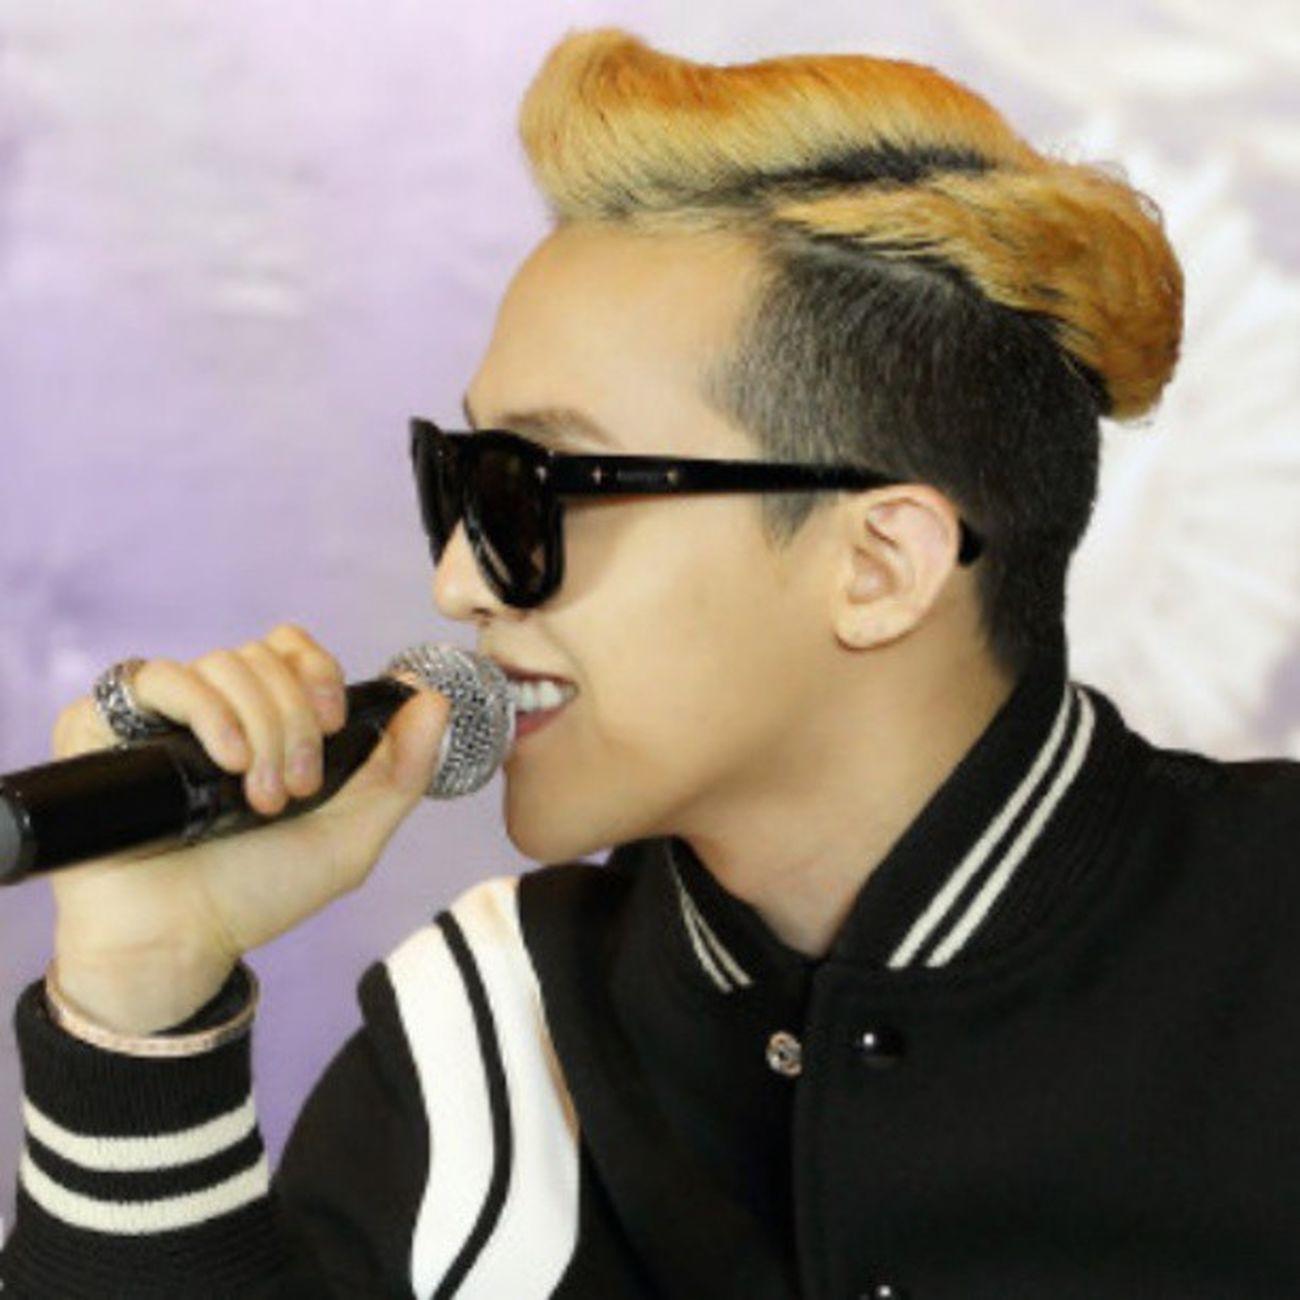 Gdragon GD GD Jiyong bigbang oneofakindworldtour 权志龙 gdragon gd GD jiyong bigbang oneofakindworldtour 权志龙